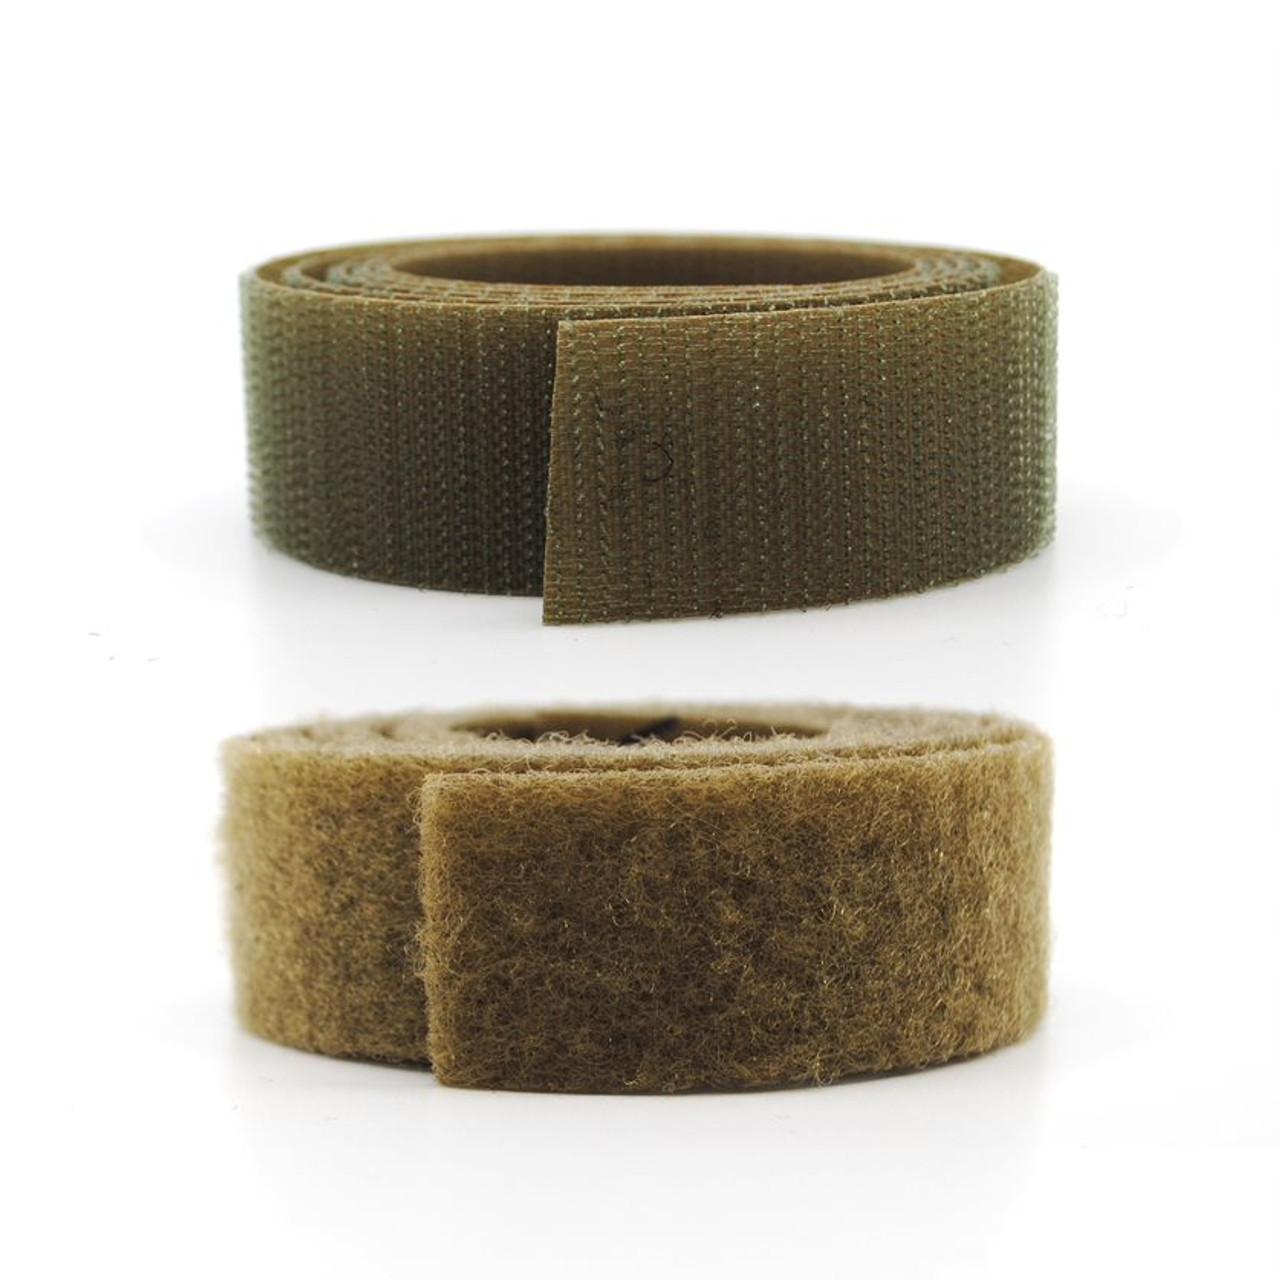 VELCRO® Brand Nylon Sew-On Tape - Mil Spec - Tan 499 Hook and Loop / Velcro Fasteners